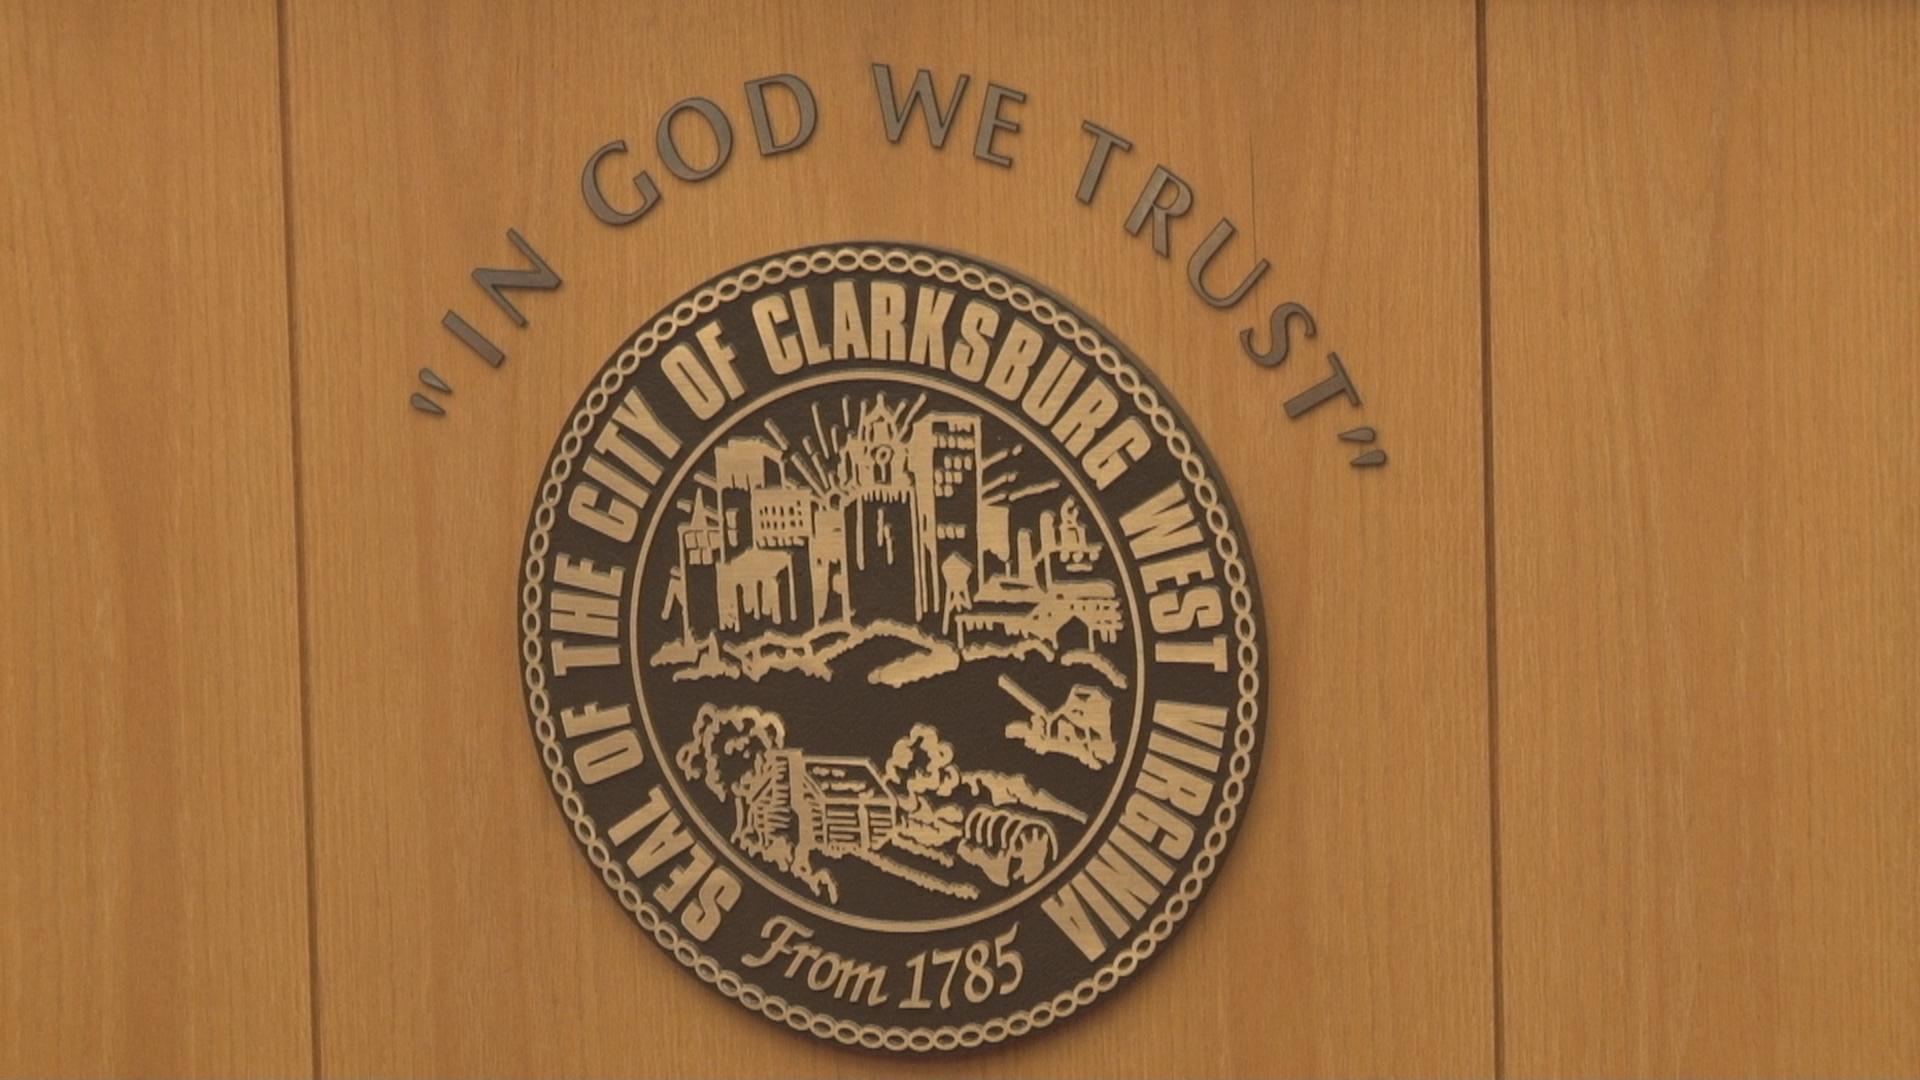 Clarksburg City Council 8.17.17_1517532743461.jpg.jpg